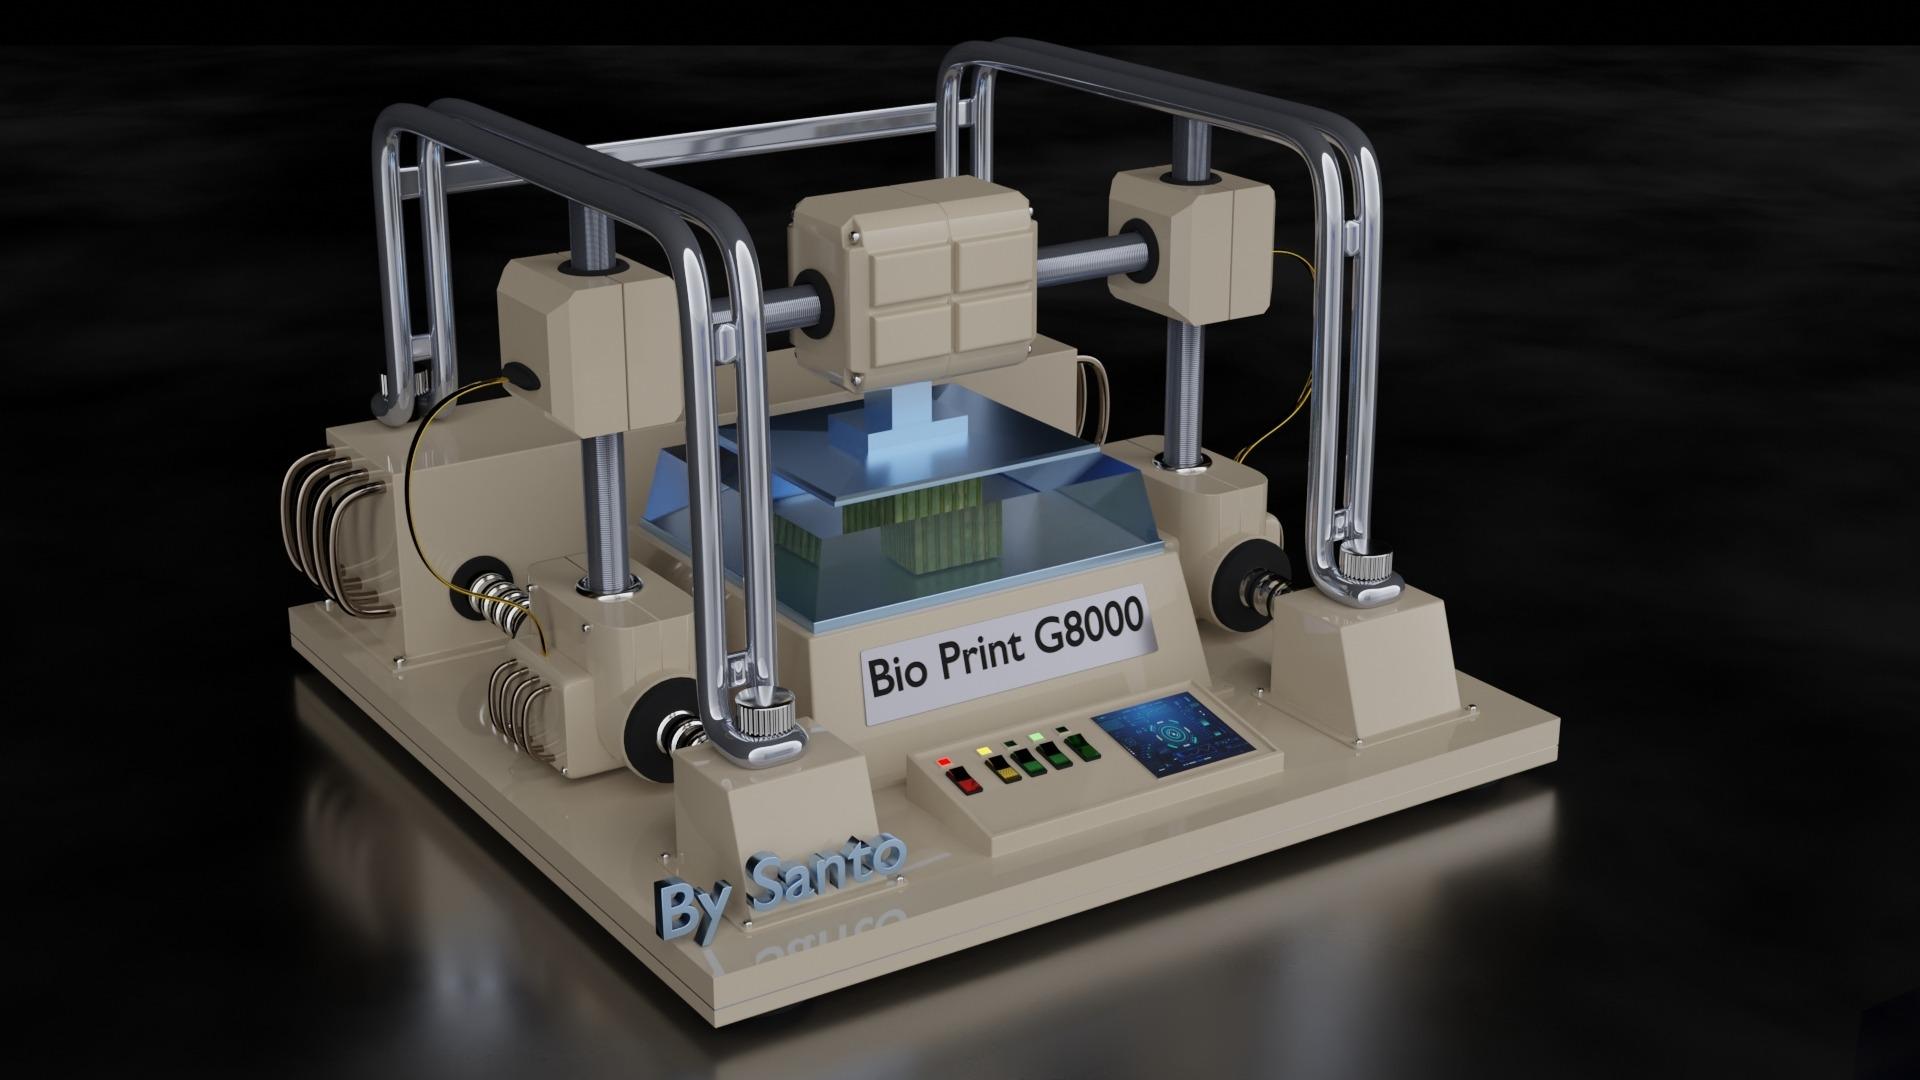 bio-print